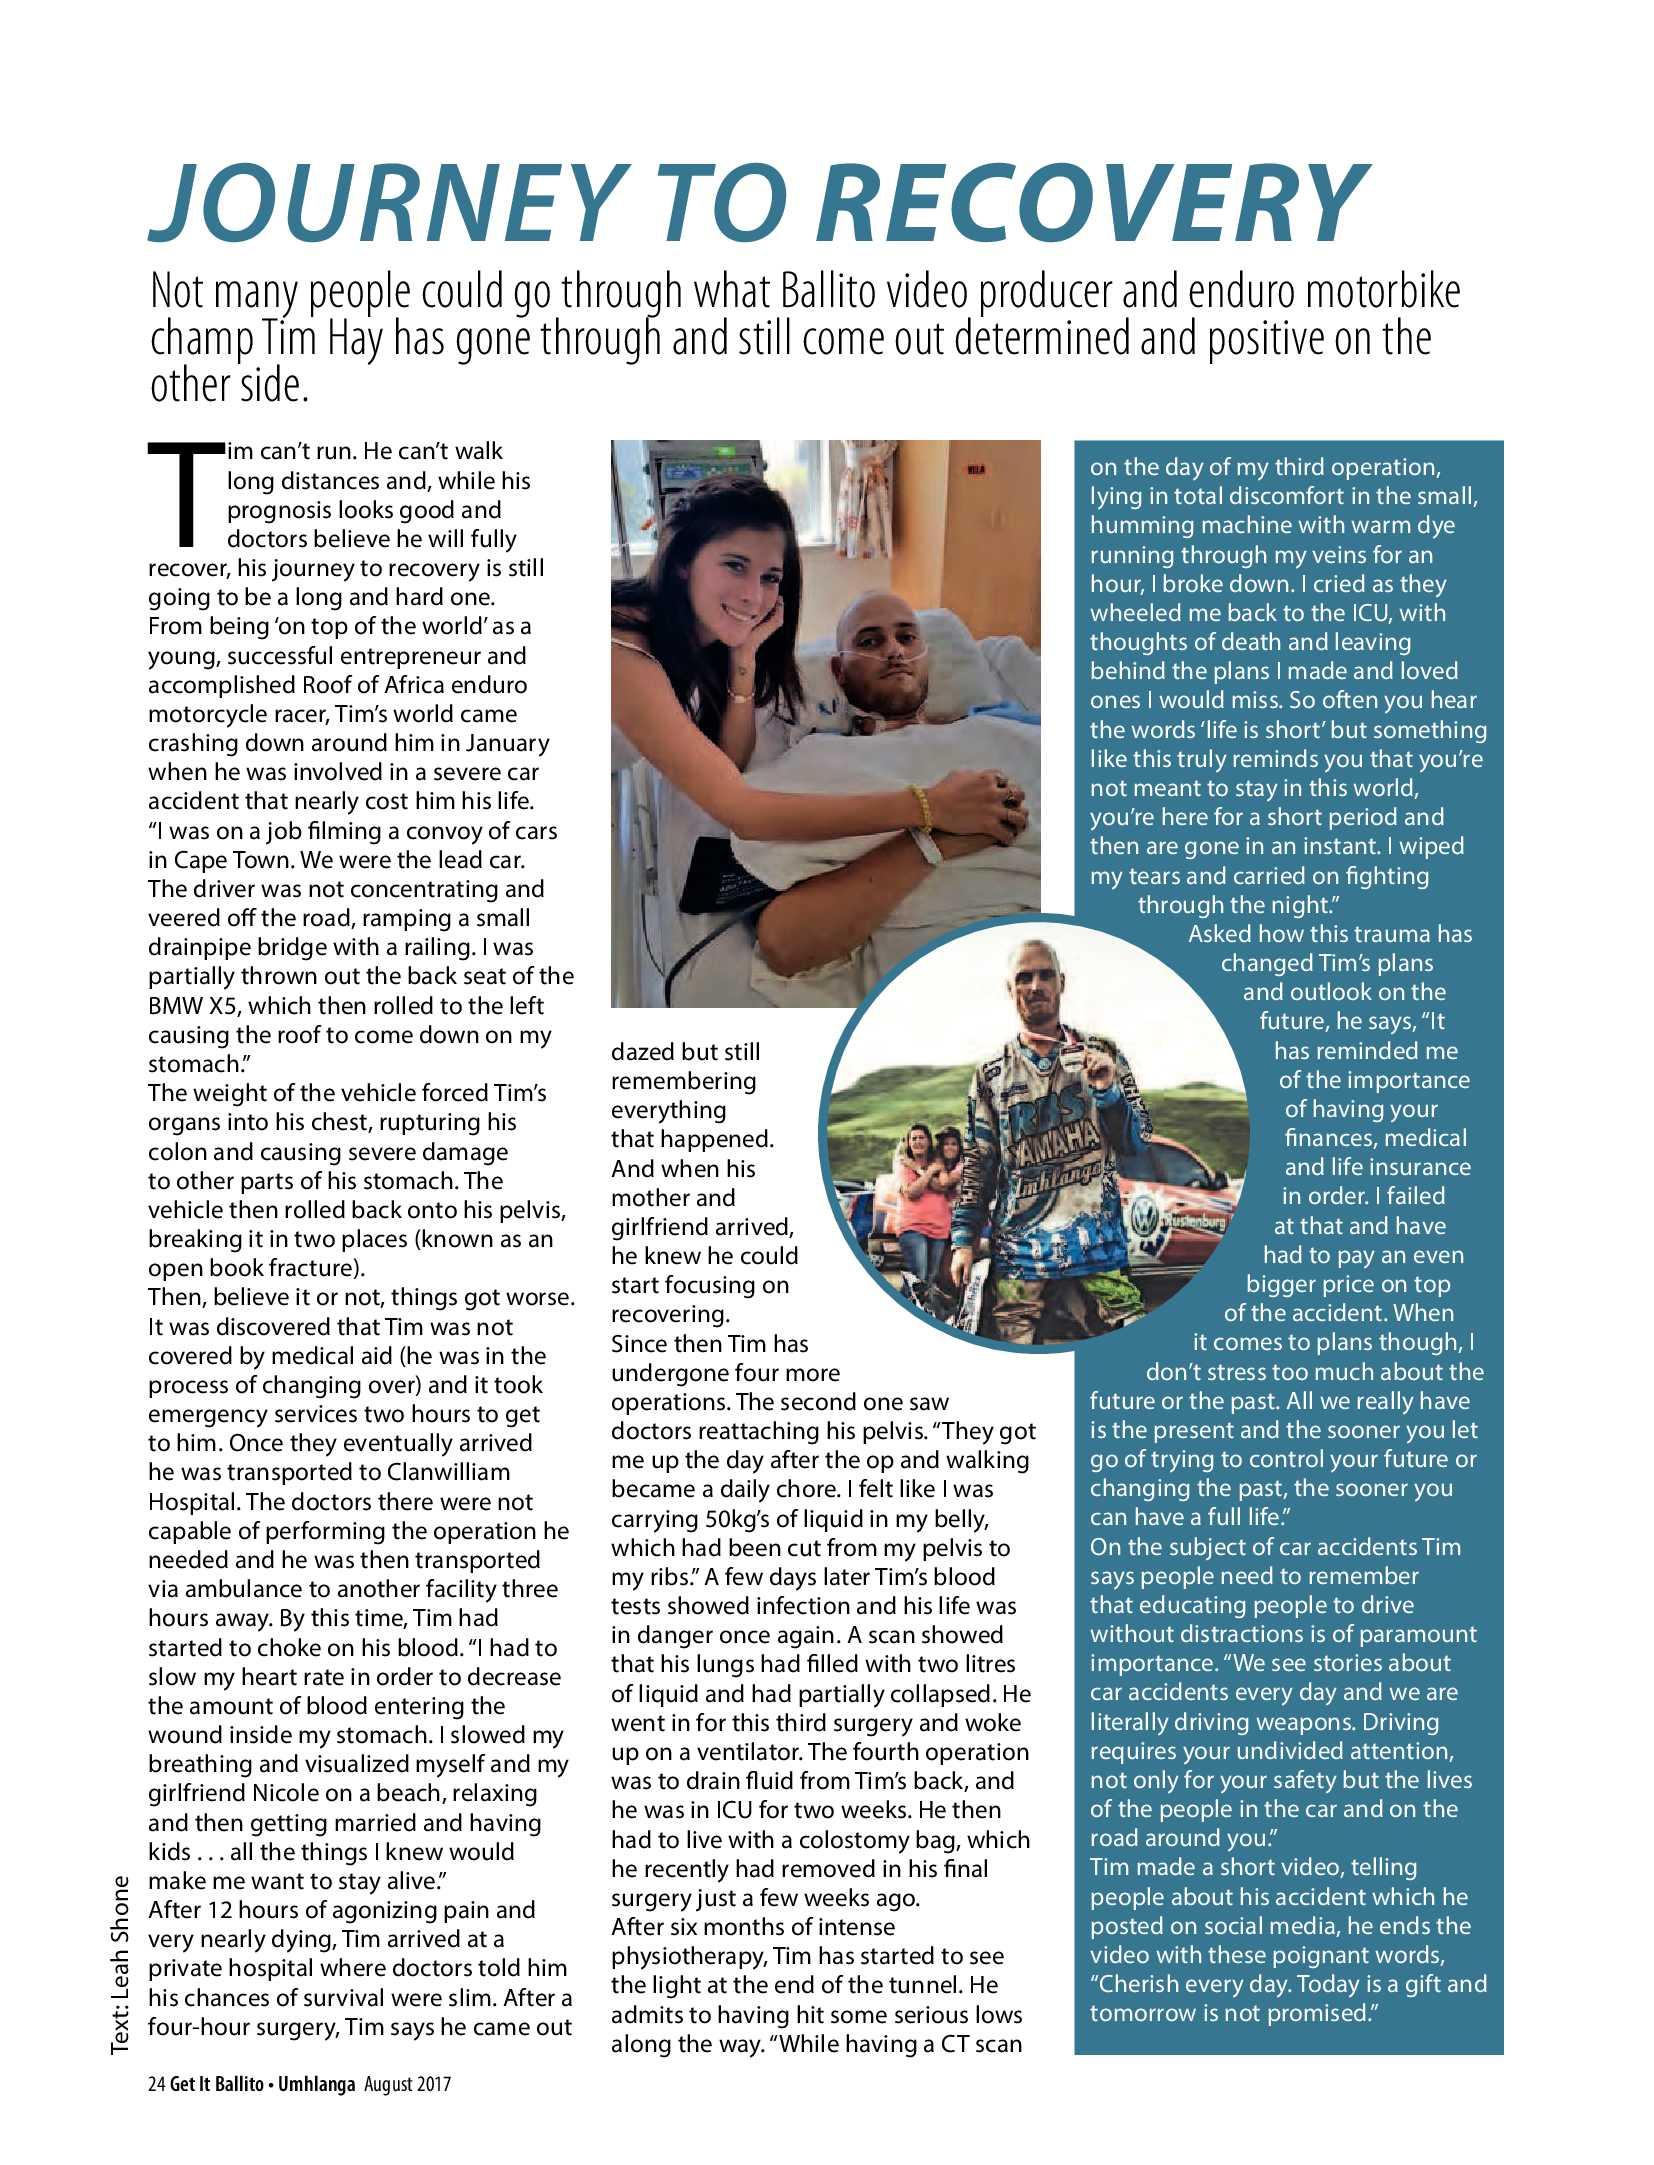 get-magazine-ballitoumhlanga-august-2017-epapers-page-26